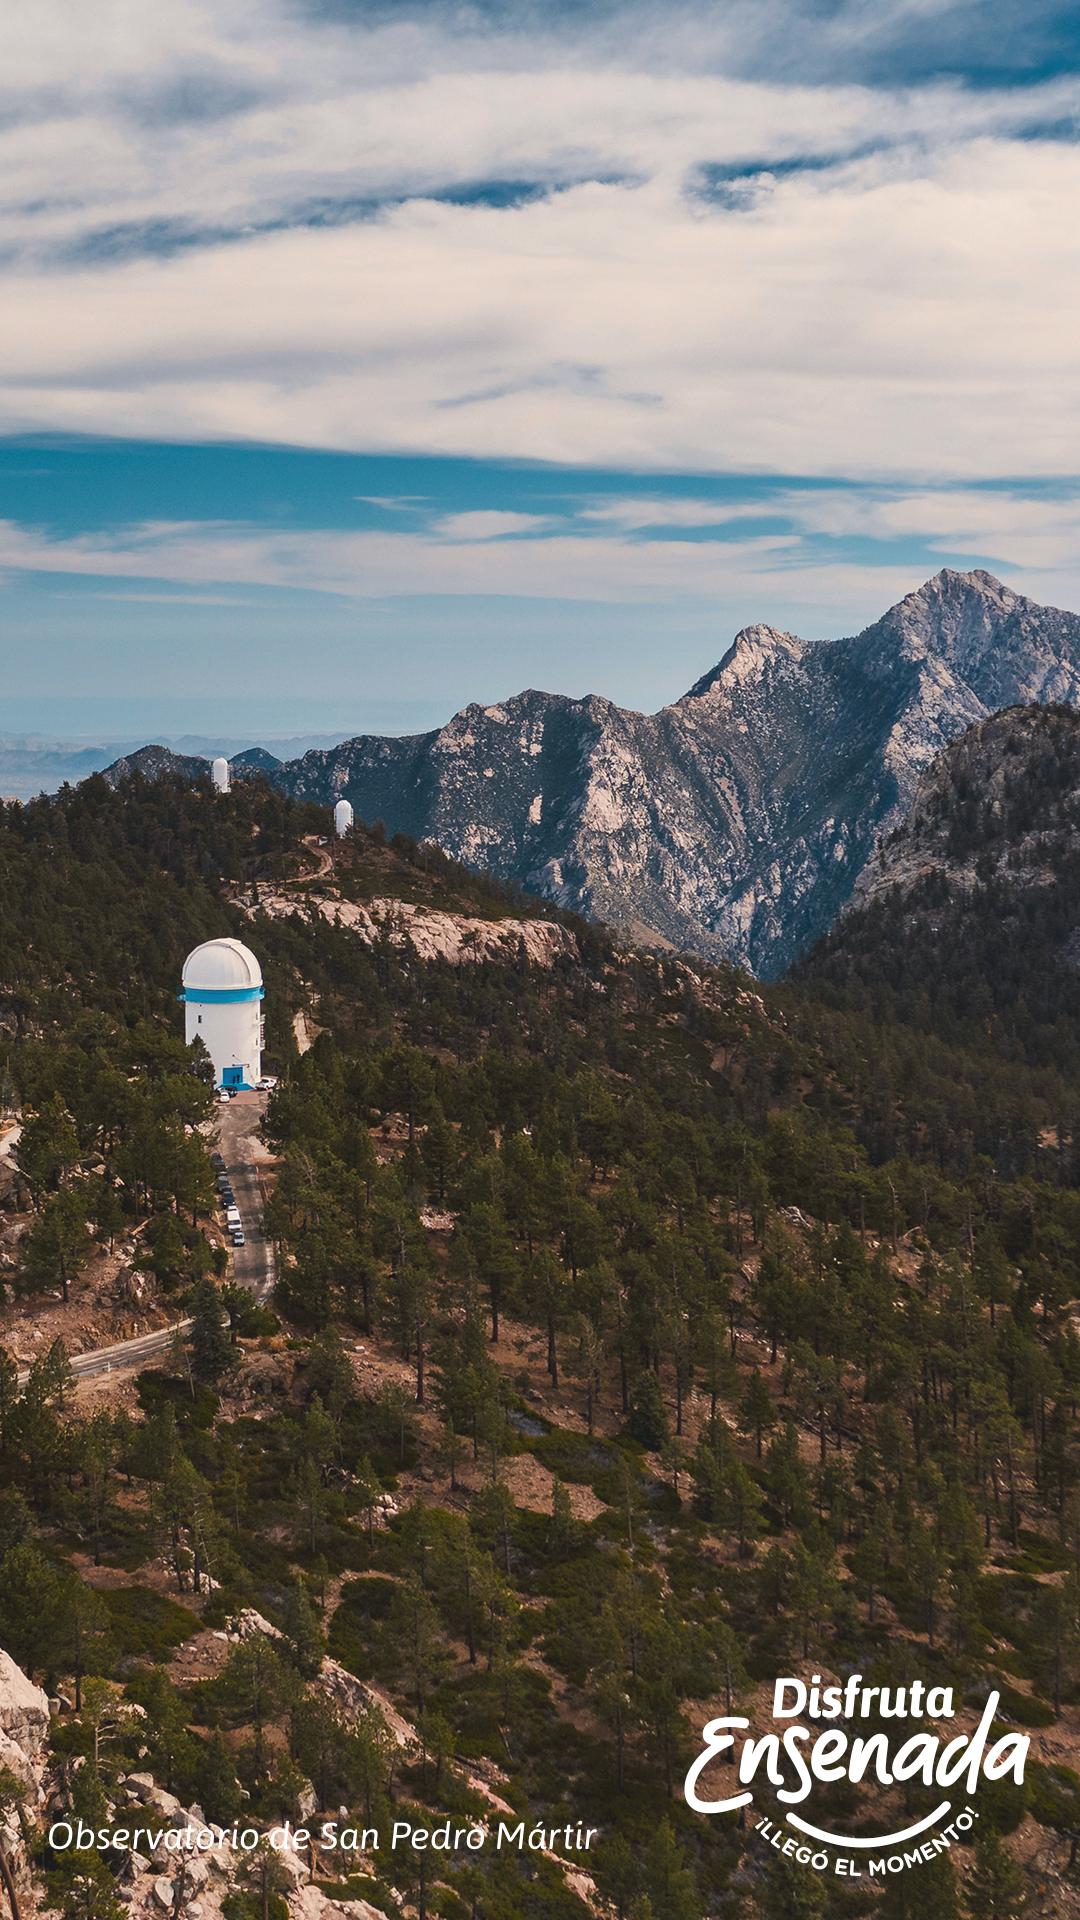 Observatorio de San Pedro Martír